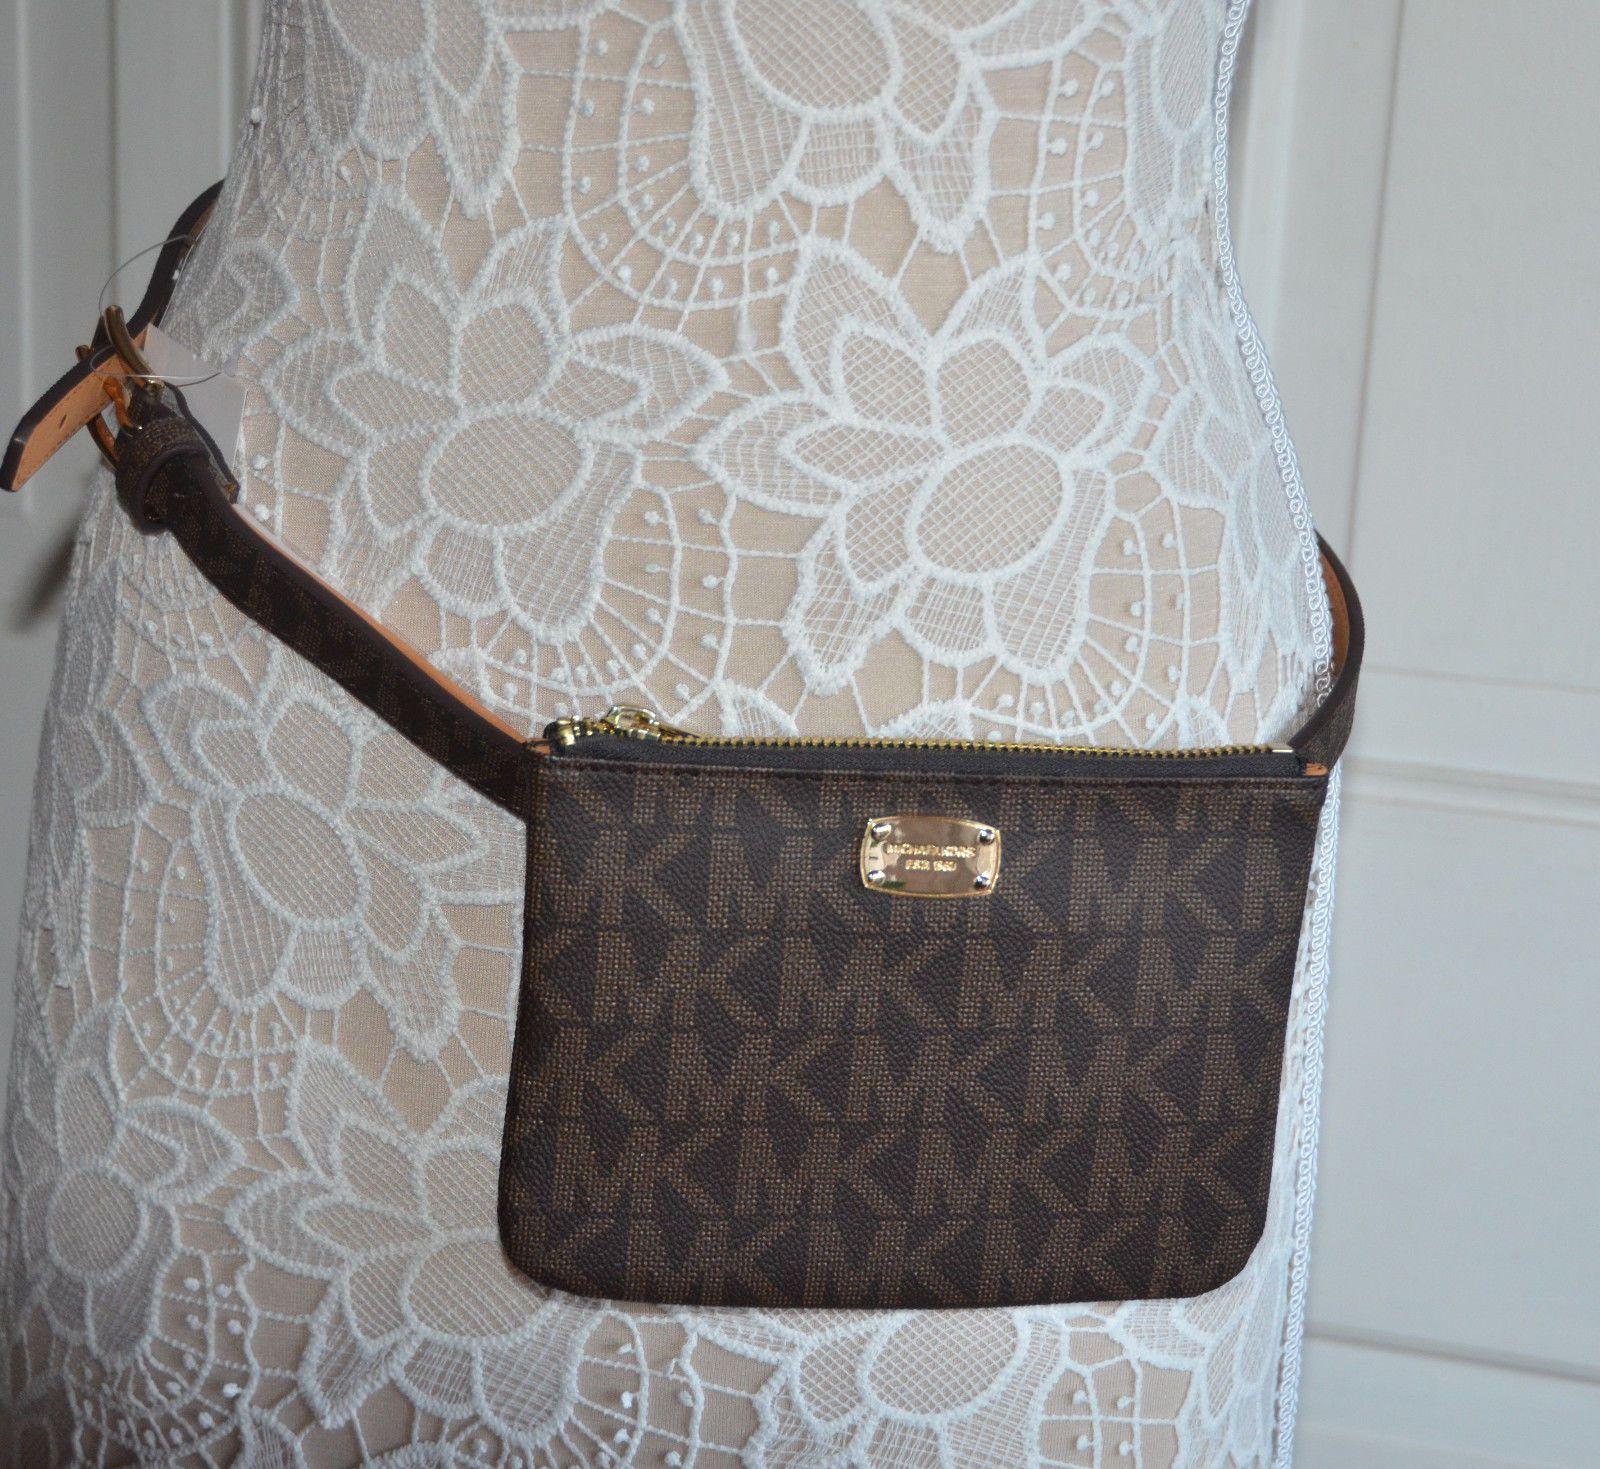 45f4805d7fbf1e NWT $78 Michael Kors Fanny Pack Belt Bag MK Logo Faux Leather Size MED BROWN